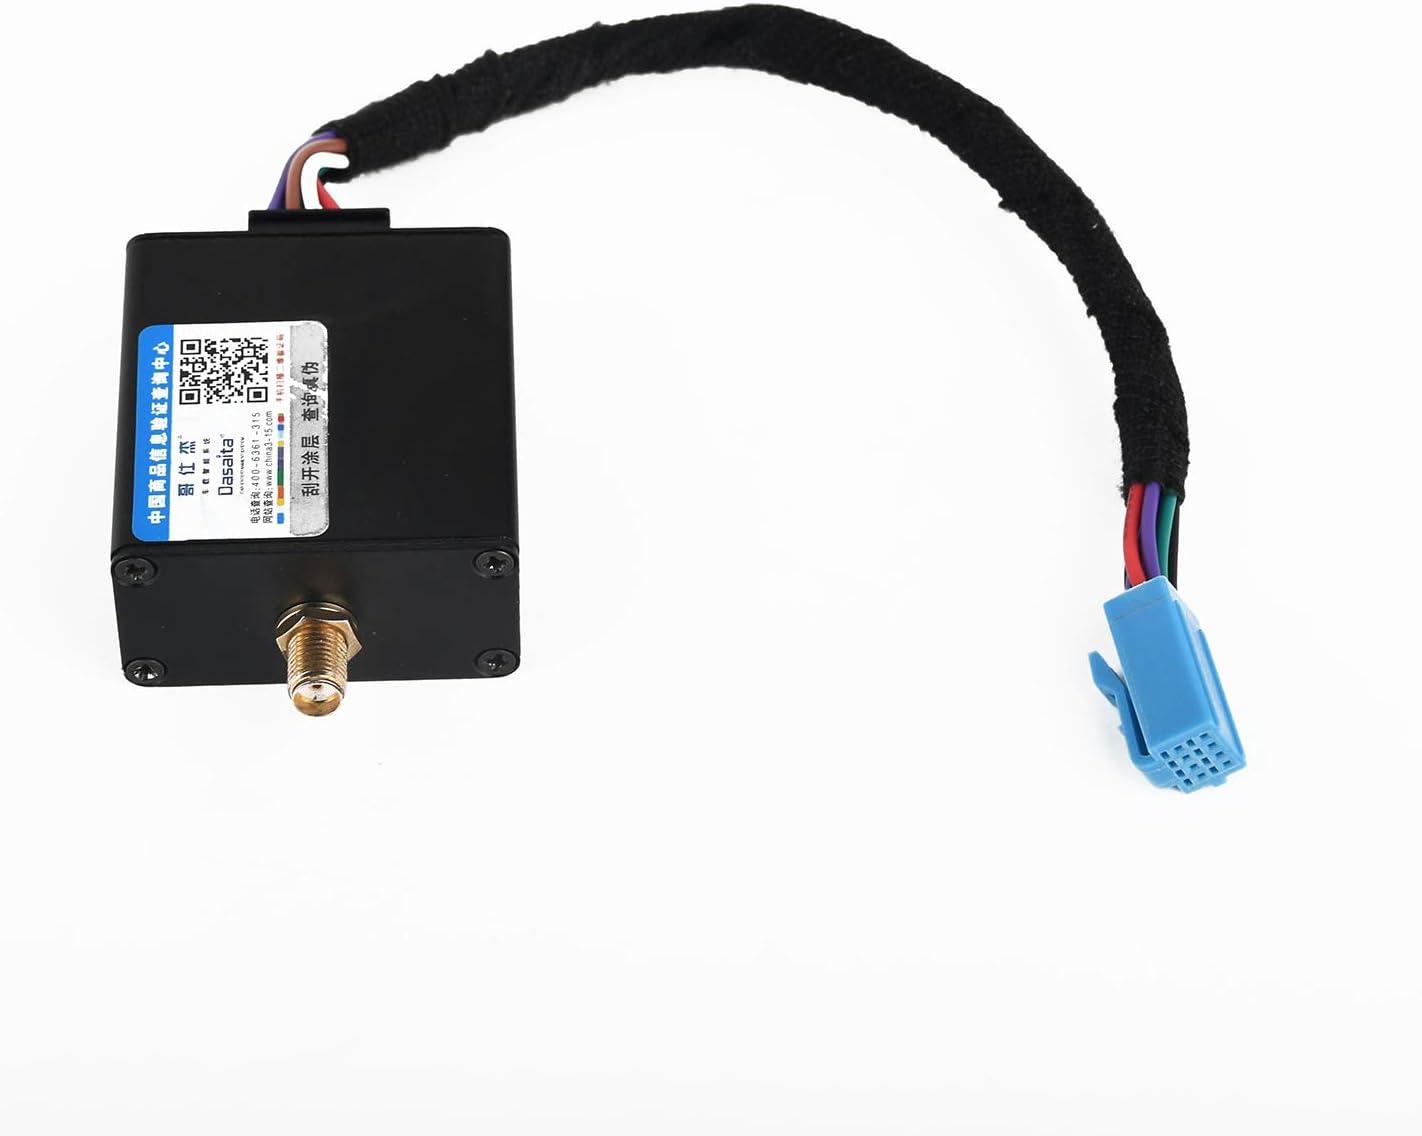 Dasaita Dab Antenna Car Adapter With Usb Port For Car Elektronik